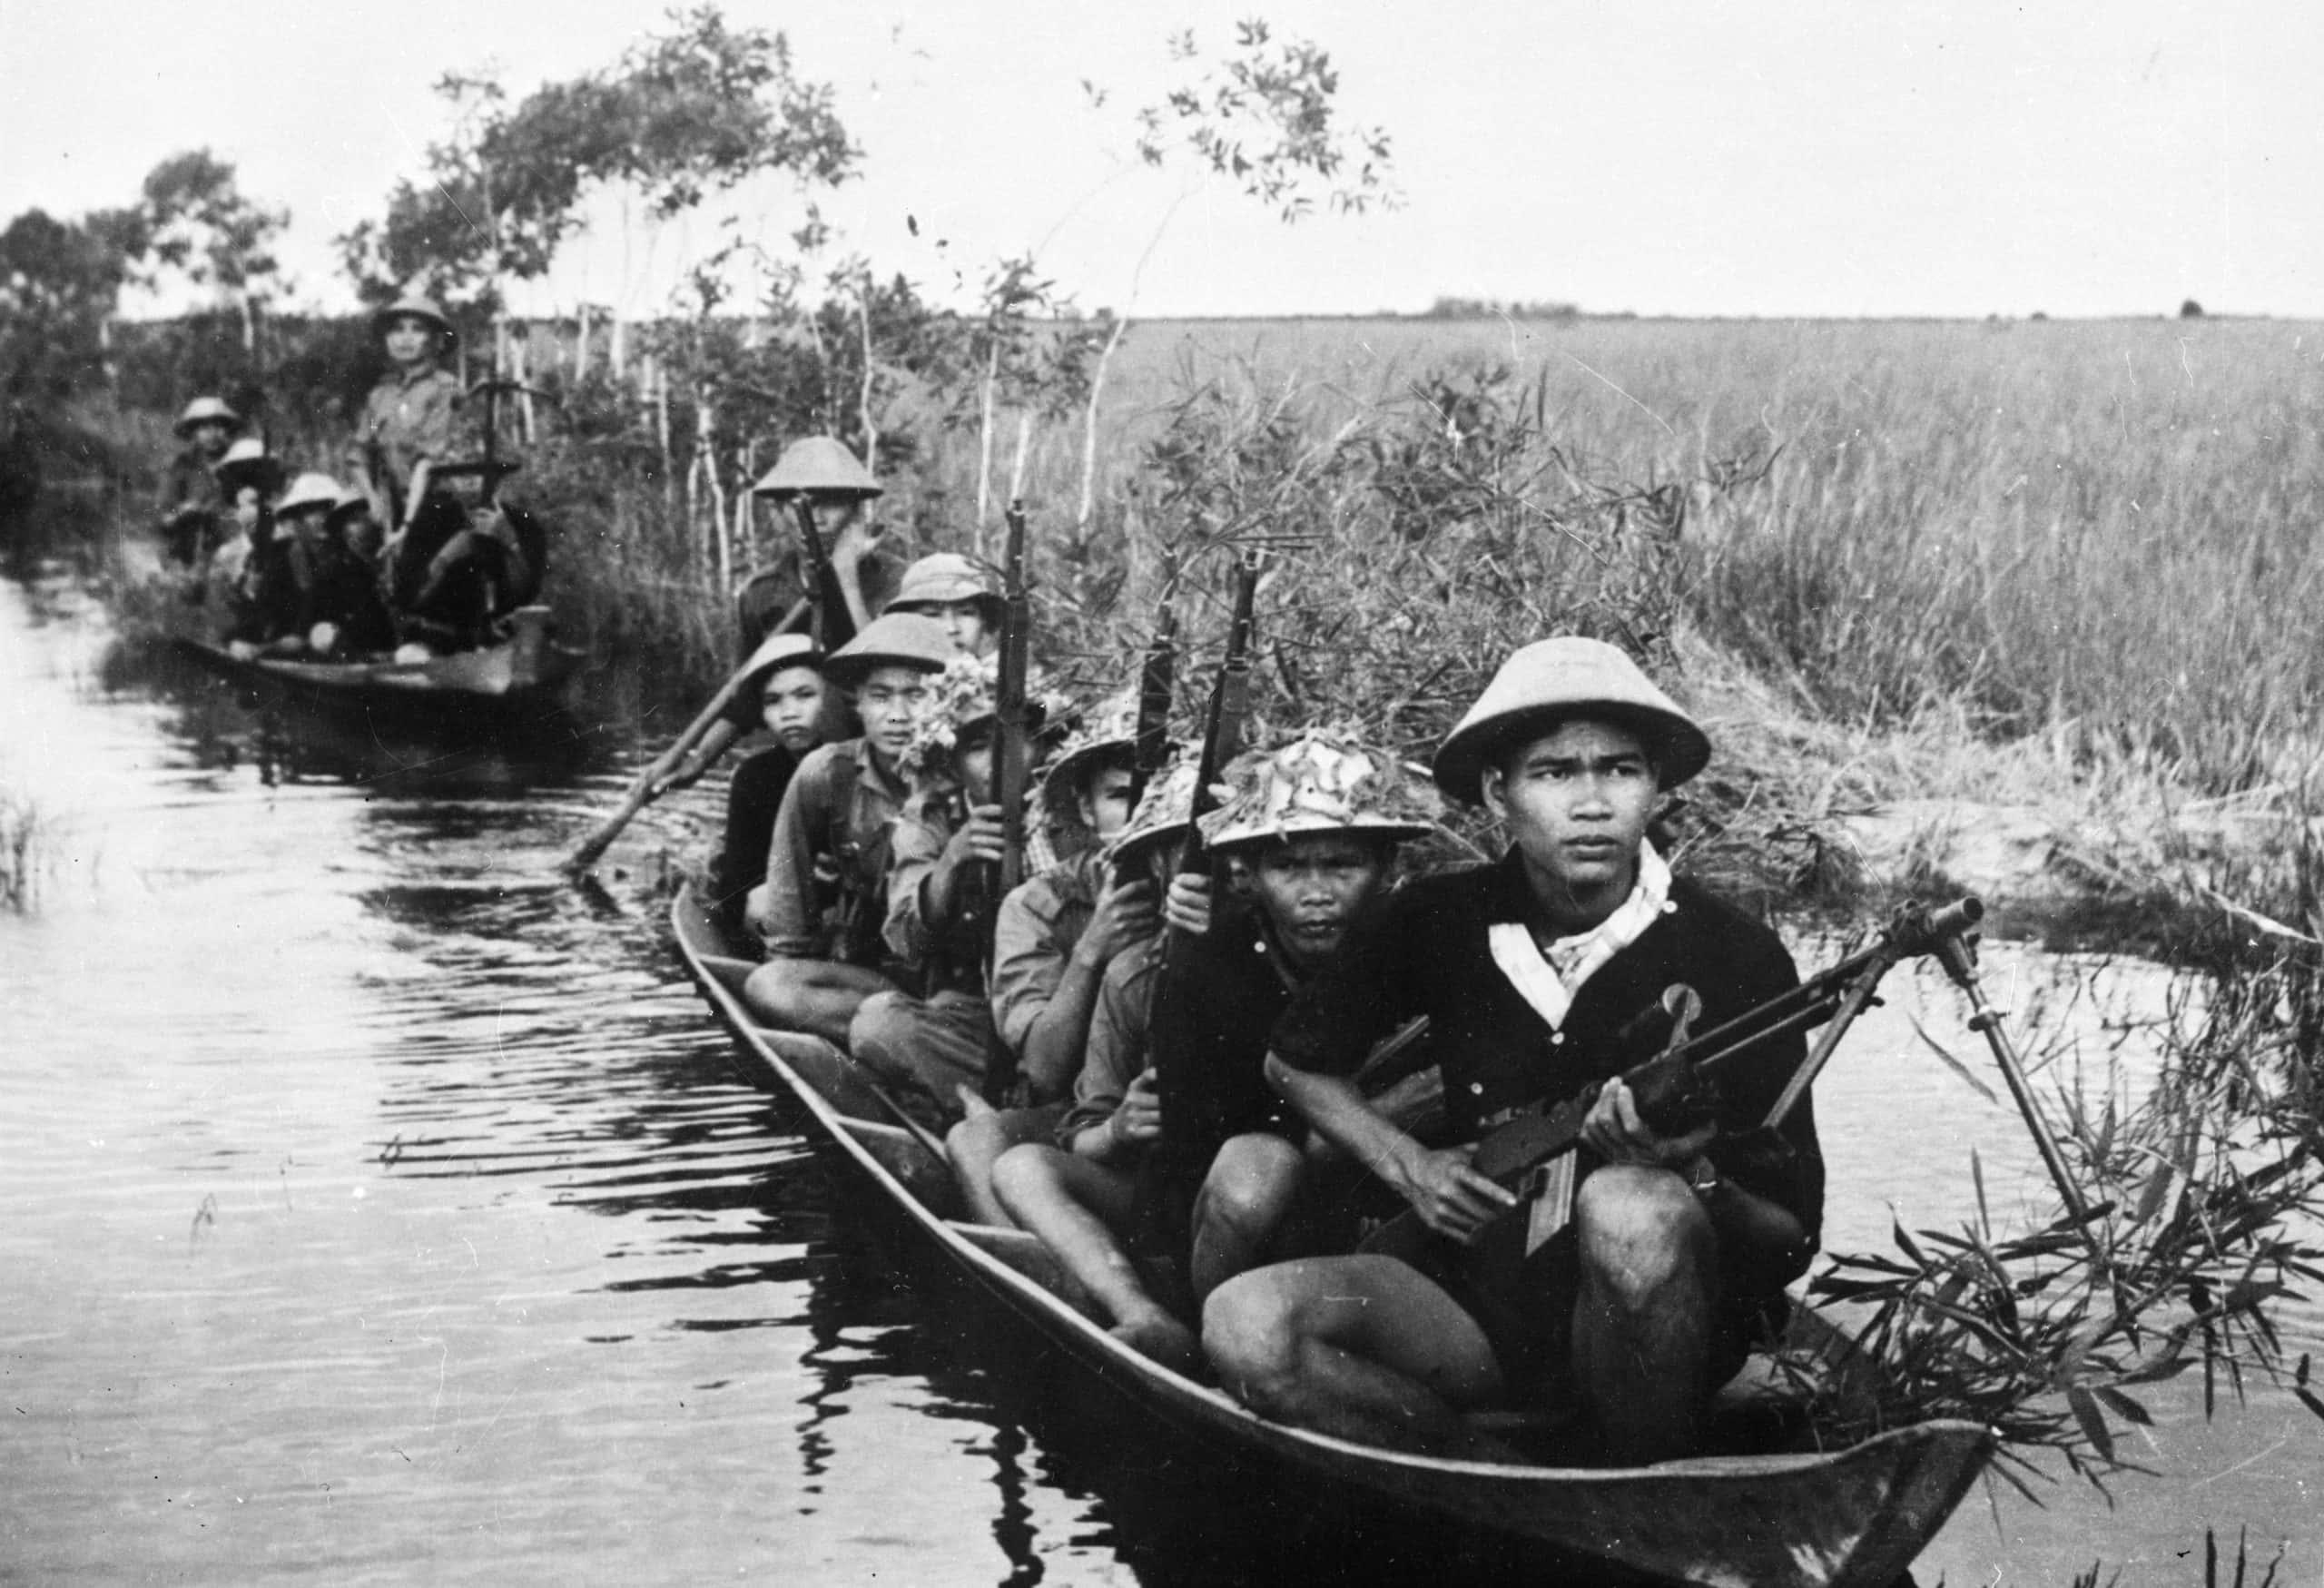 How did the vietnam war end